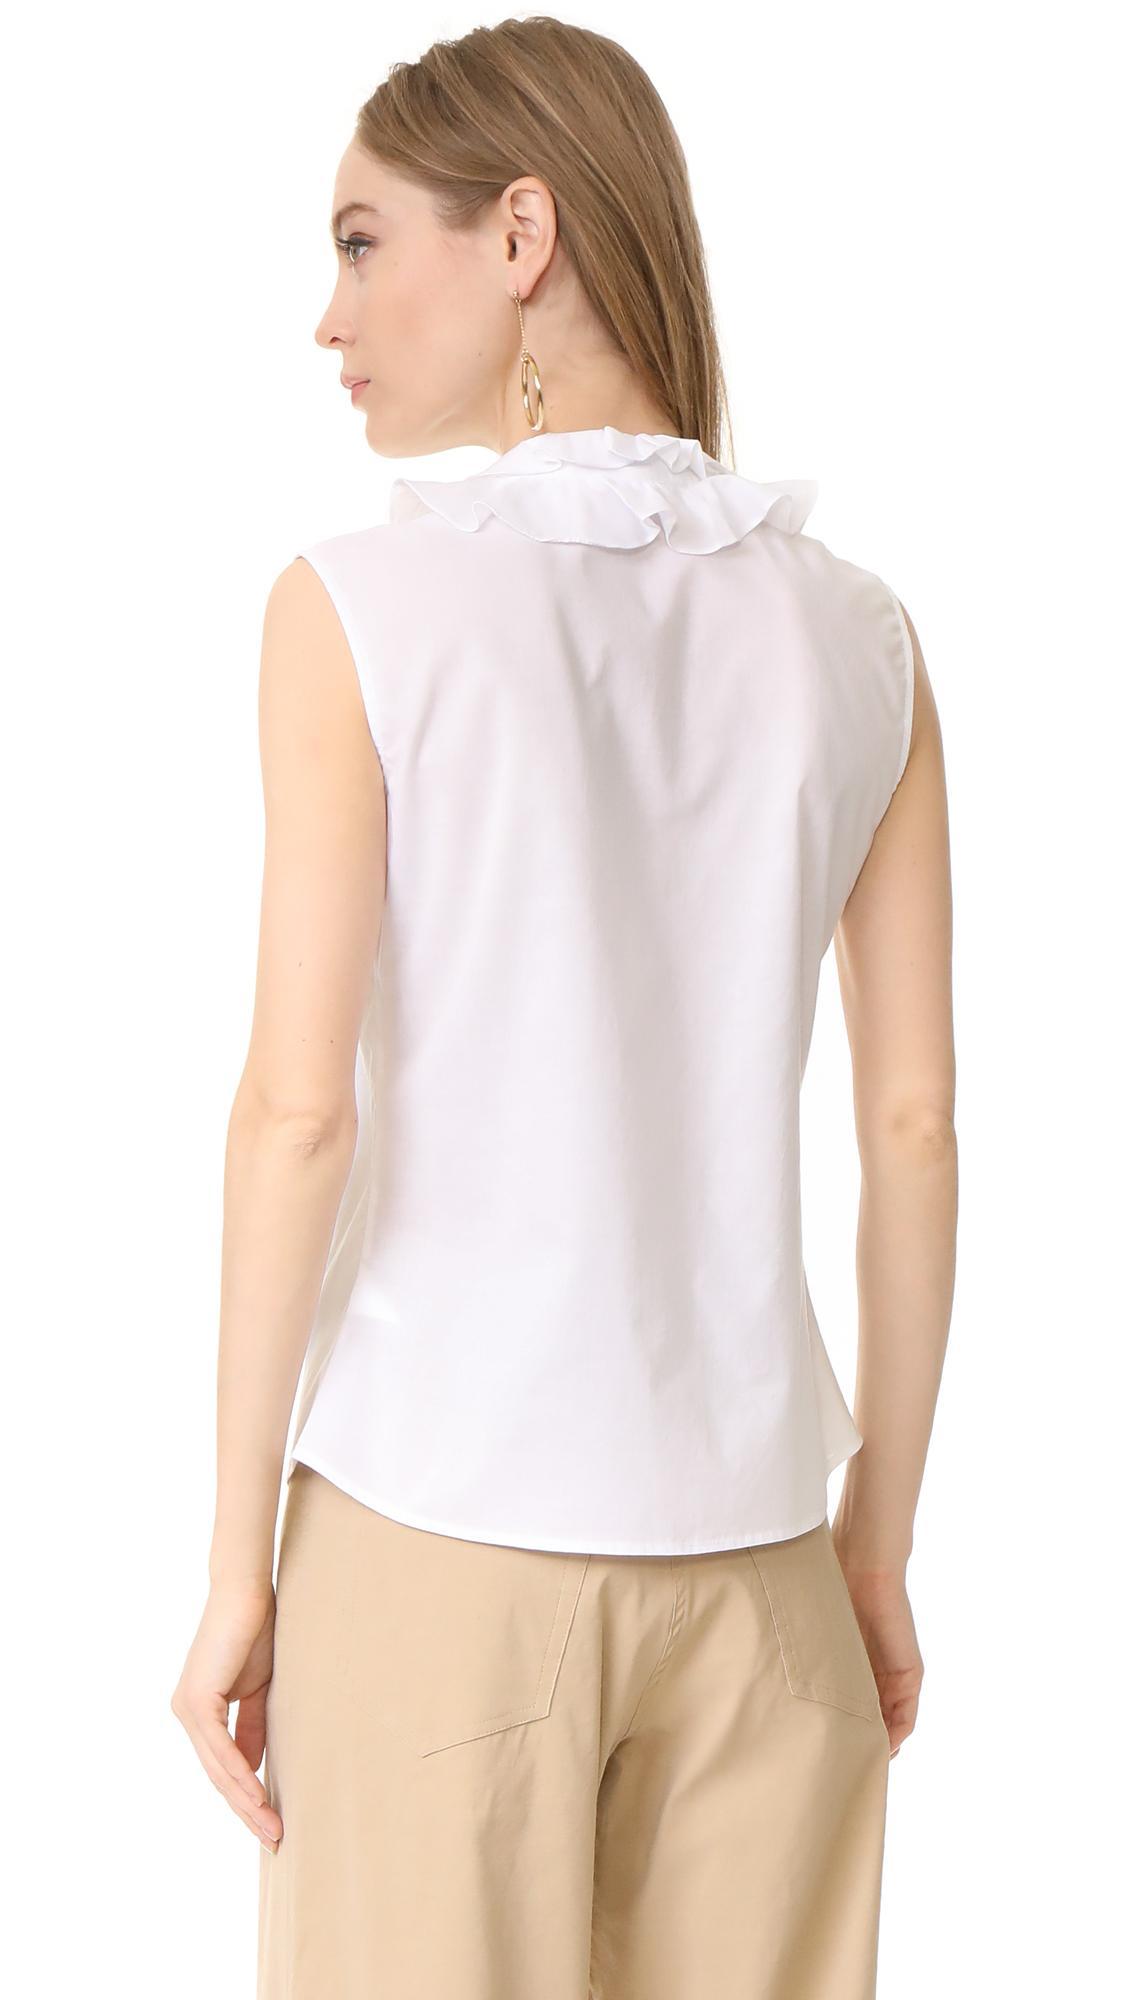 Lyst tome sleeveless ruffle collar shirt in white for Sleeveless white shirt with collar